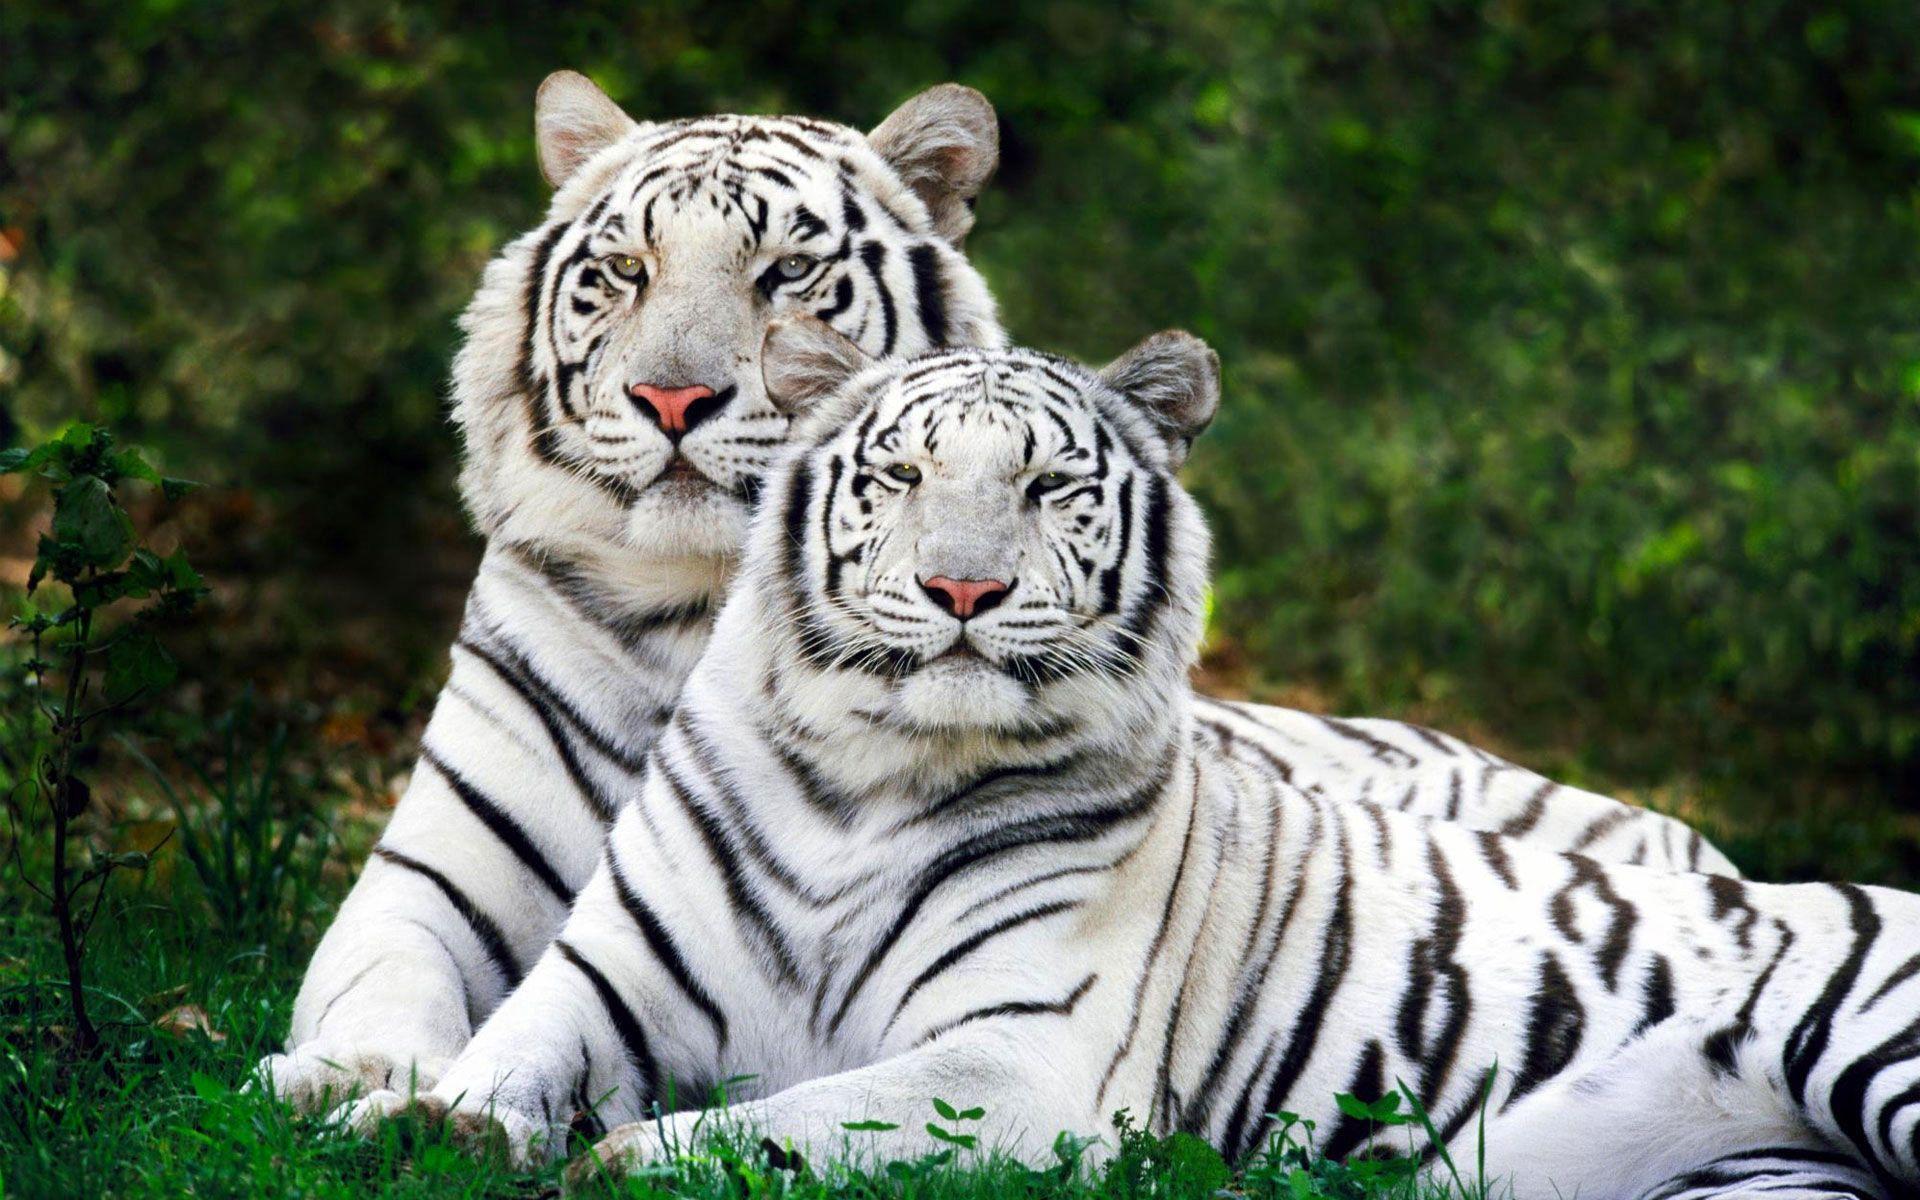 Couple Felins Herbes Poils Gris Repos Tigre Blanc Animaux Feroces Felin Sauvage Animaux Nature